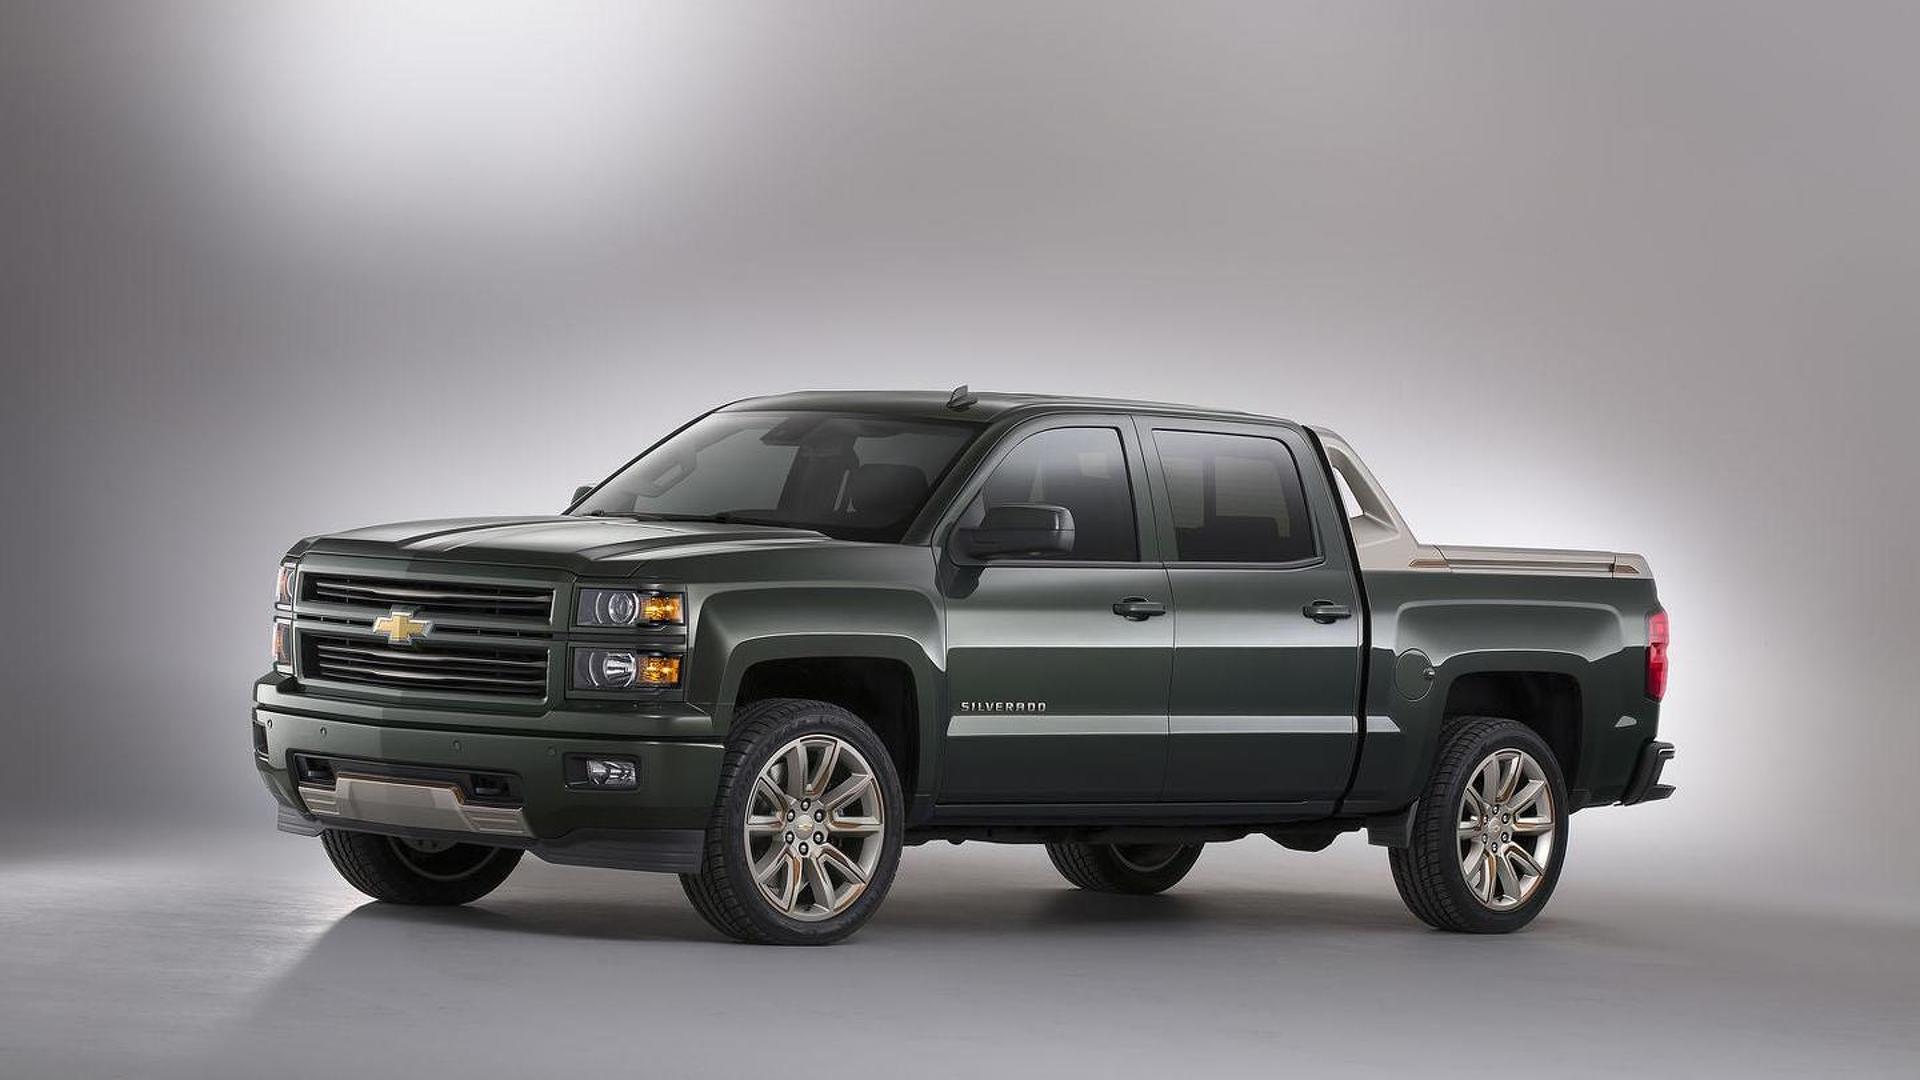 Chevrolet Silverado High Desert & Tahoe / Suburban Premium Outdoors concepts unveiled